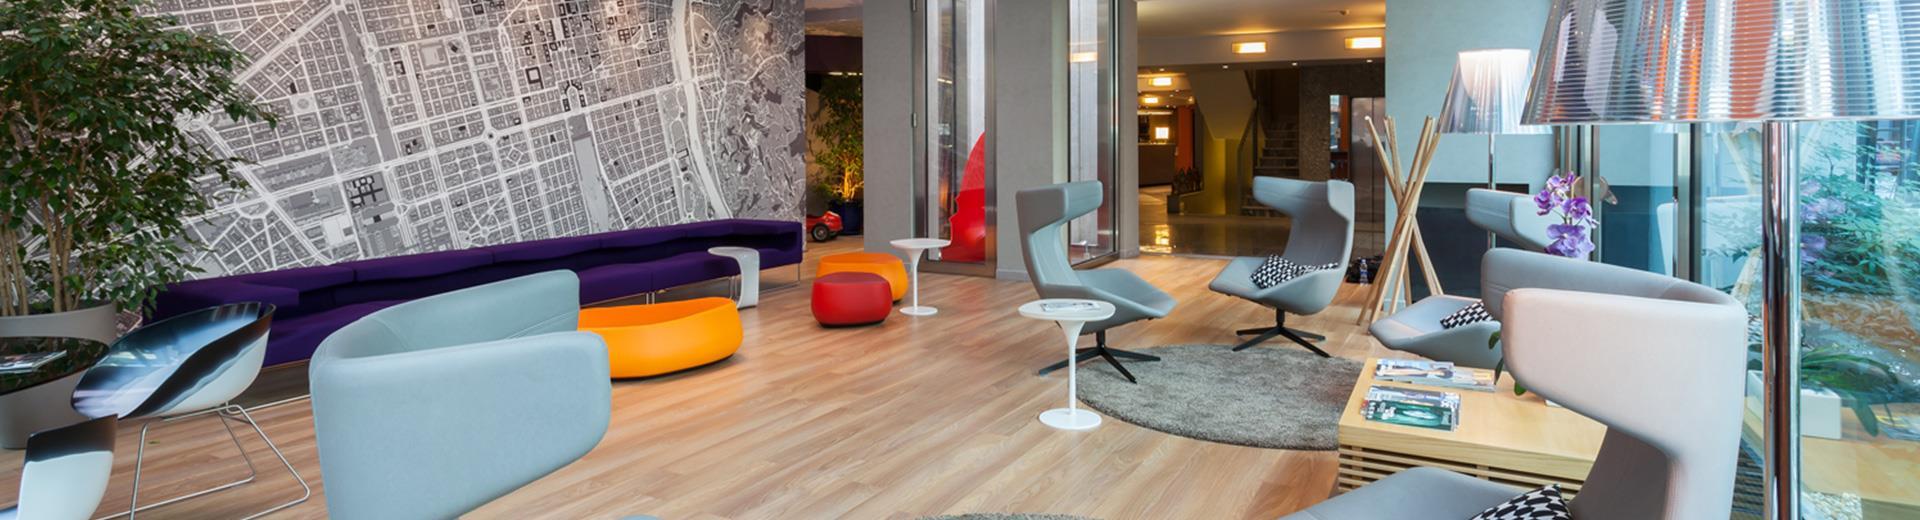 Hotel turin center porta nuova 4 stars best western plus for Hotel design torino